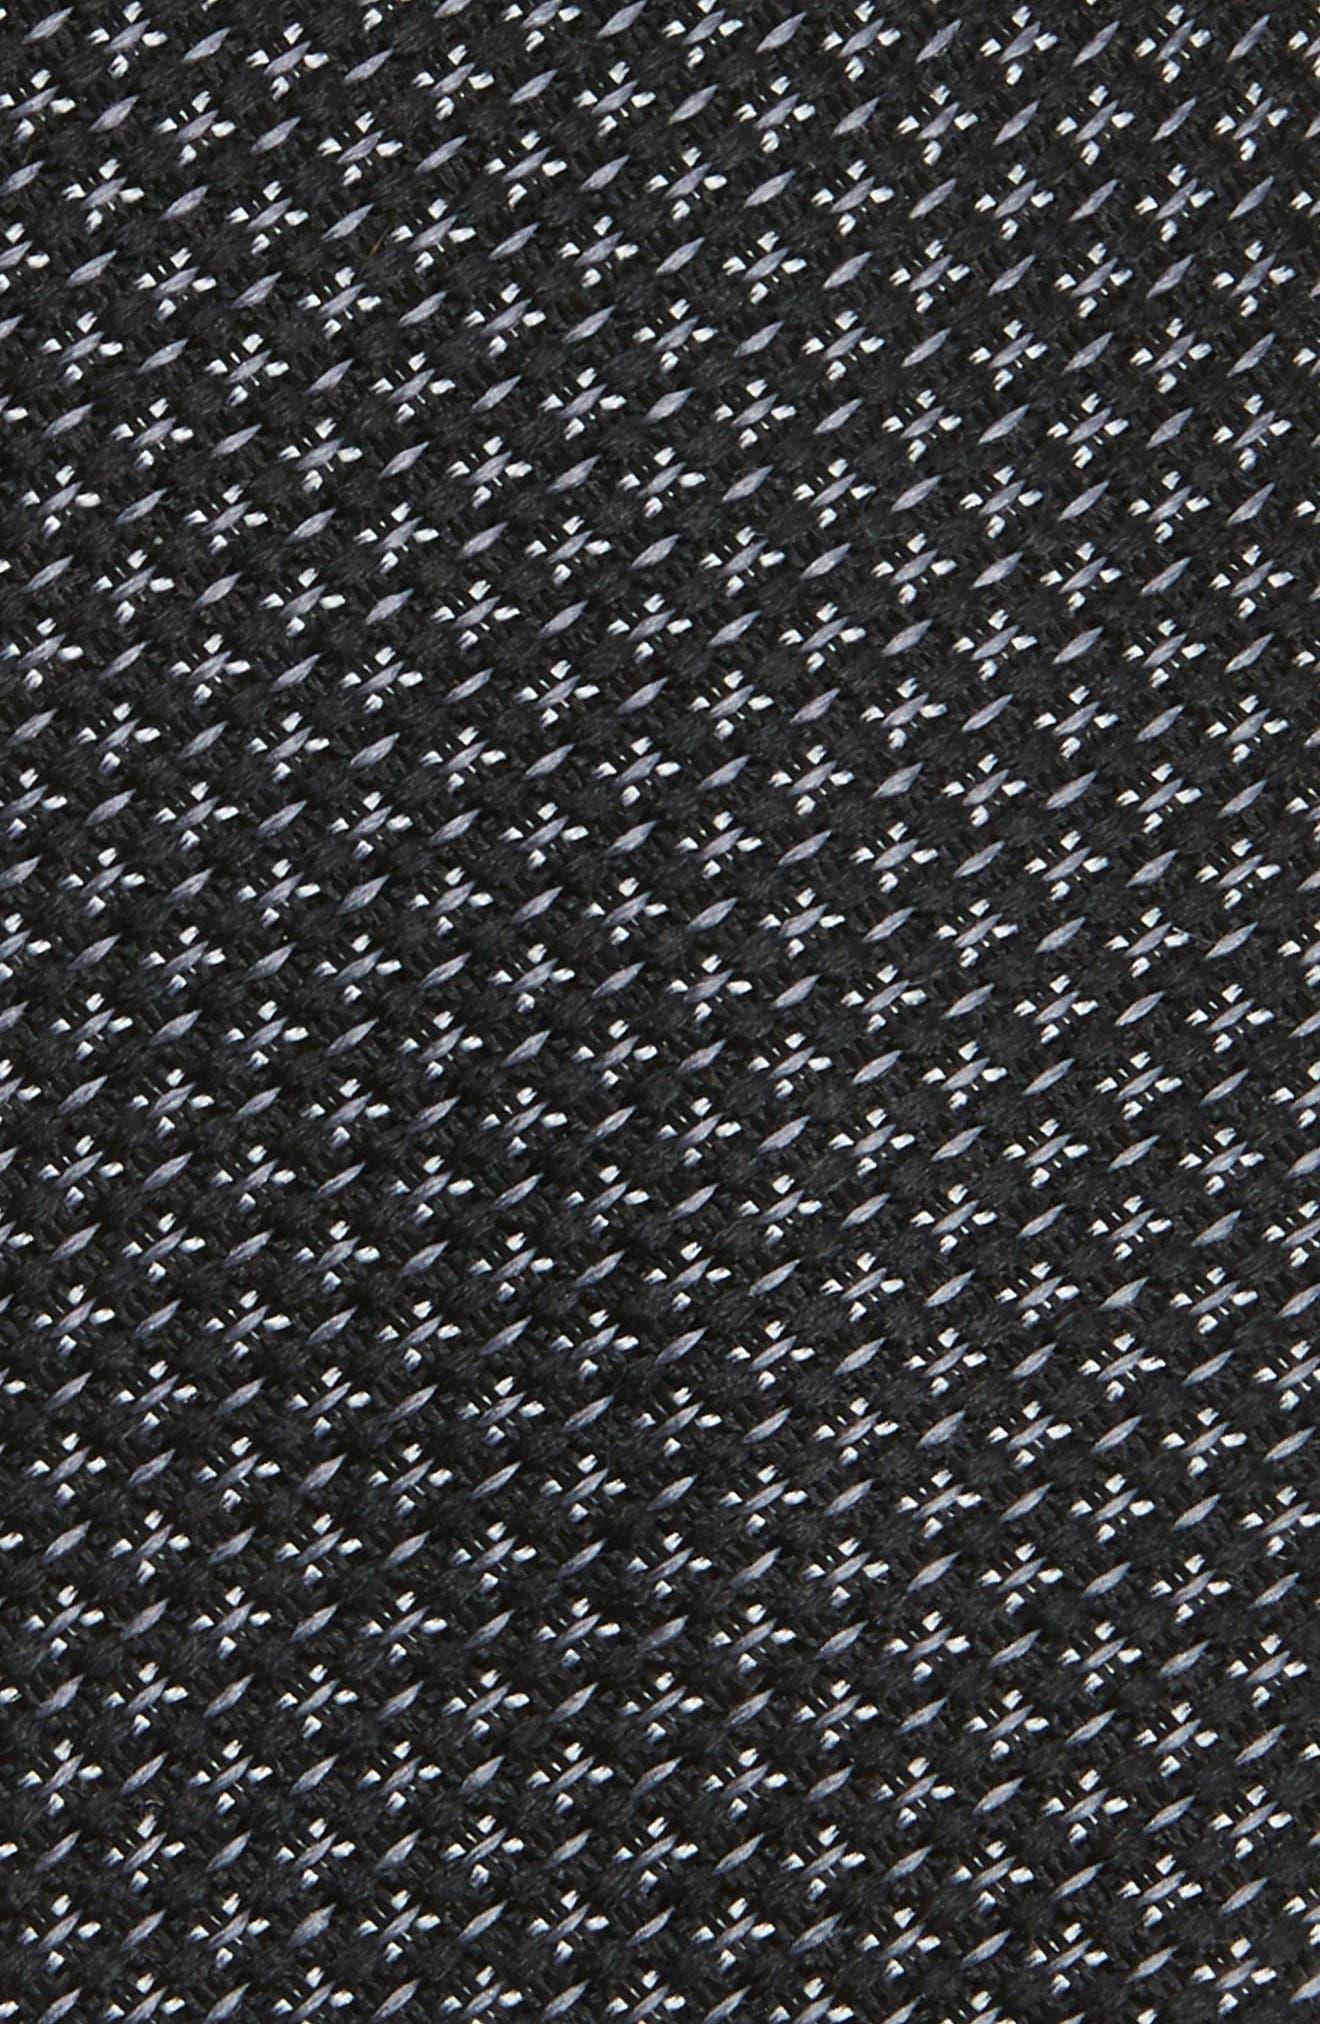 Knitex Solid Silk Tie,                             Alternate thumbnail 2, color,                             001